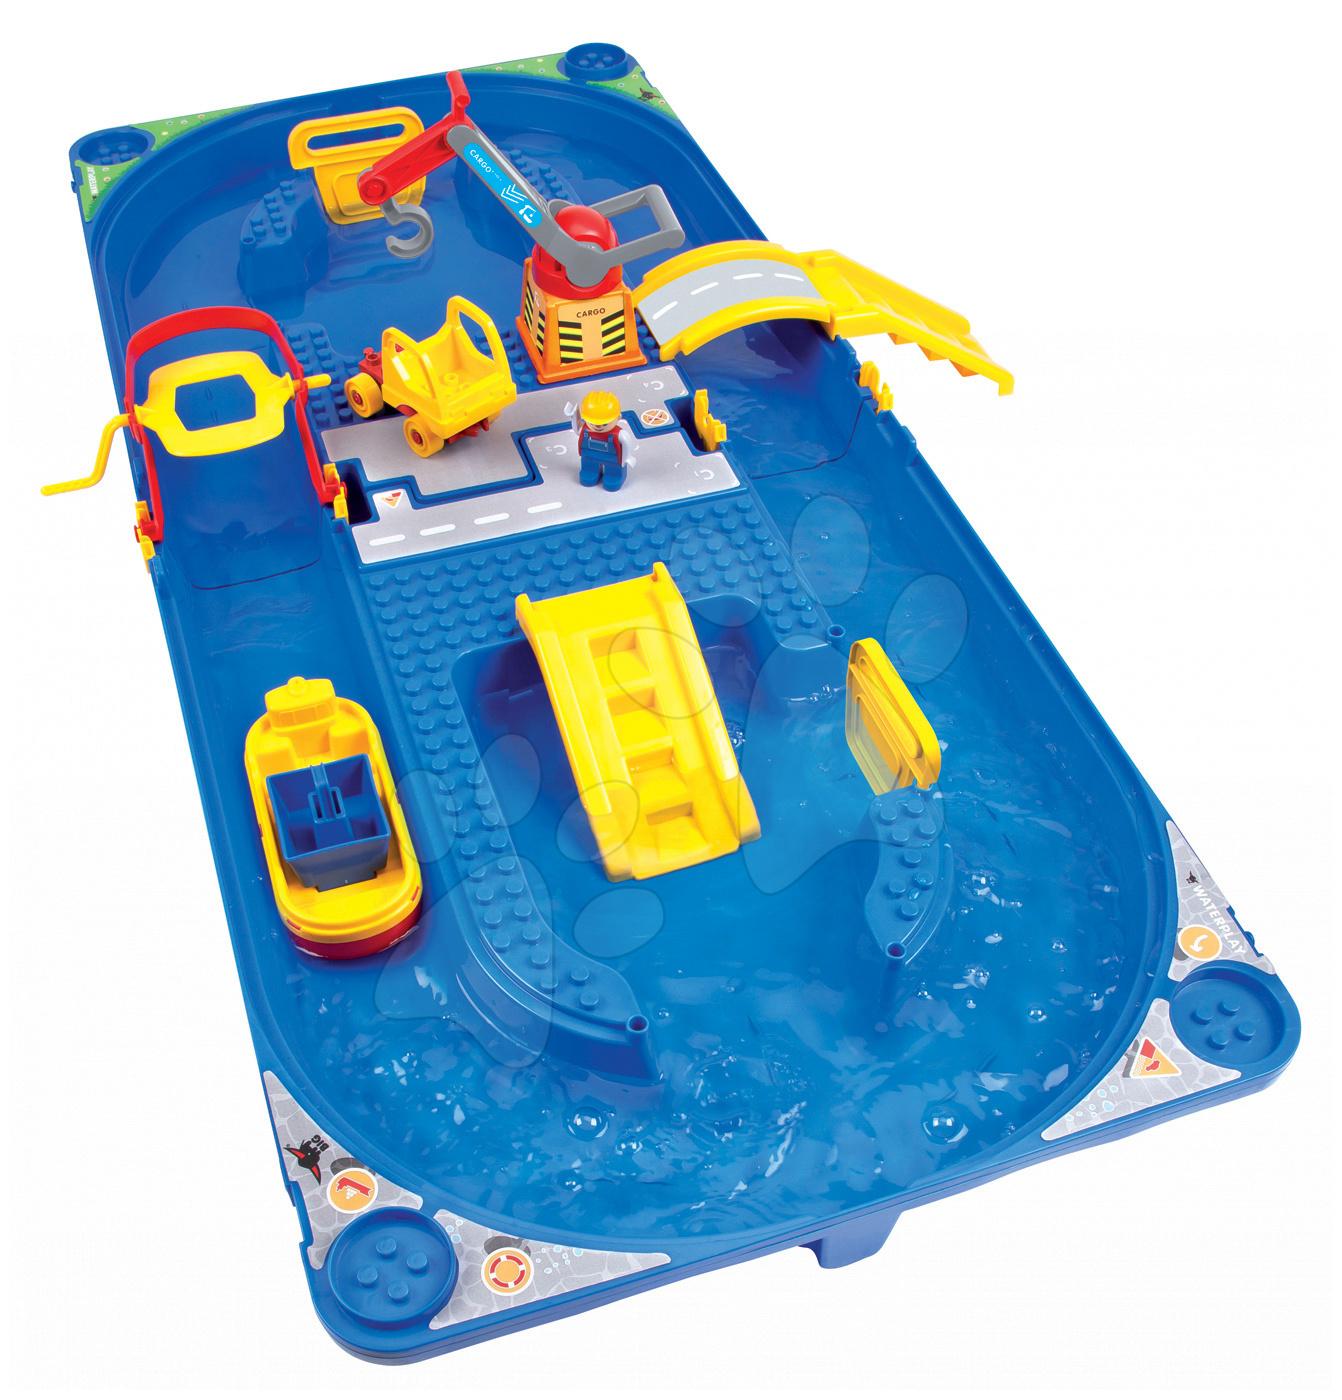 Vodná hra Waterplay Funland BIG v kufríku modrá